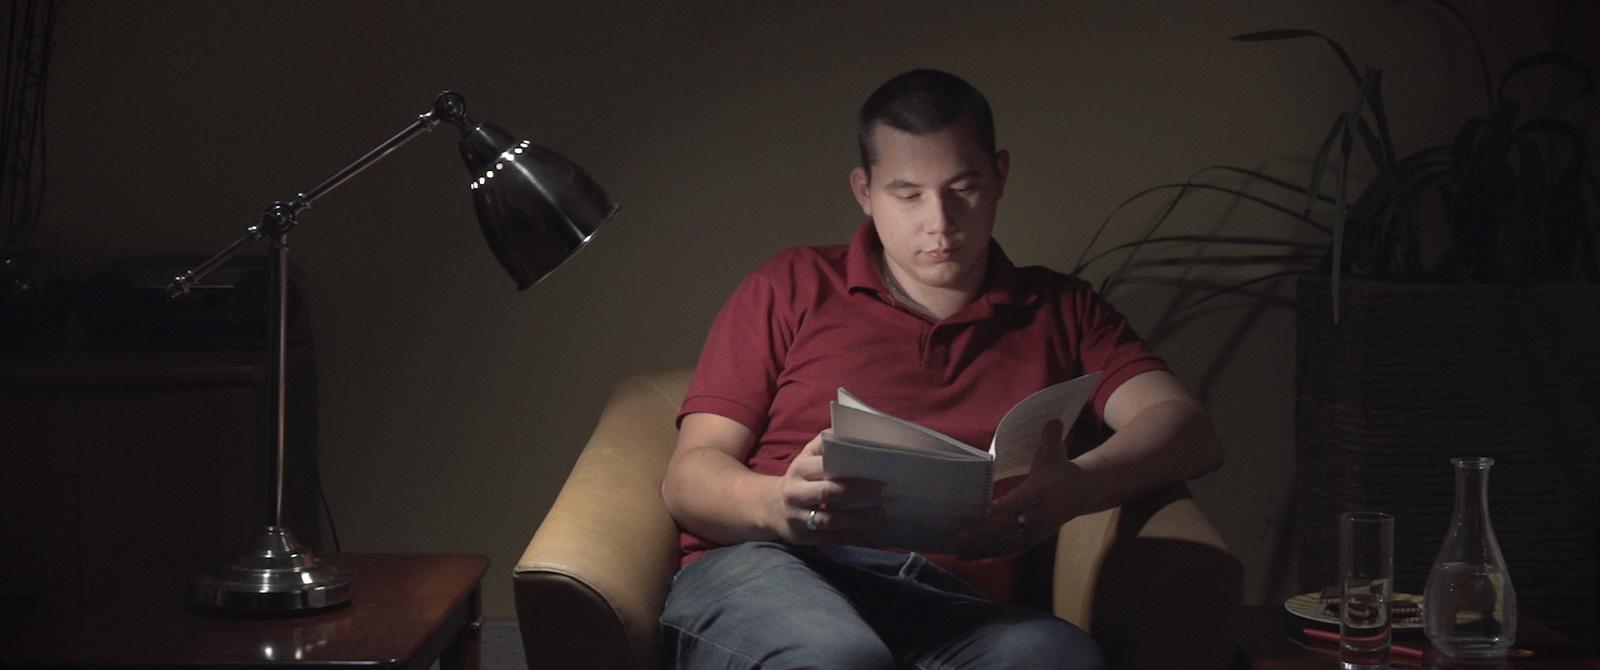 Cravate film documentaire extrême-droite